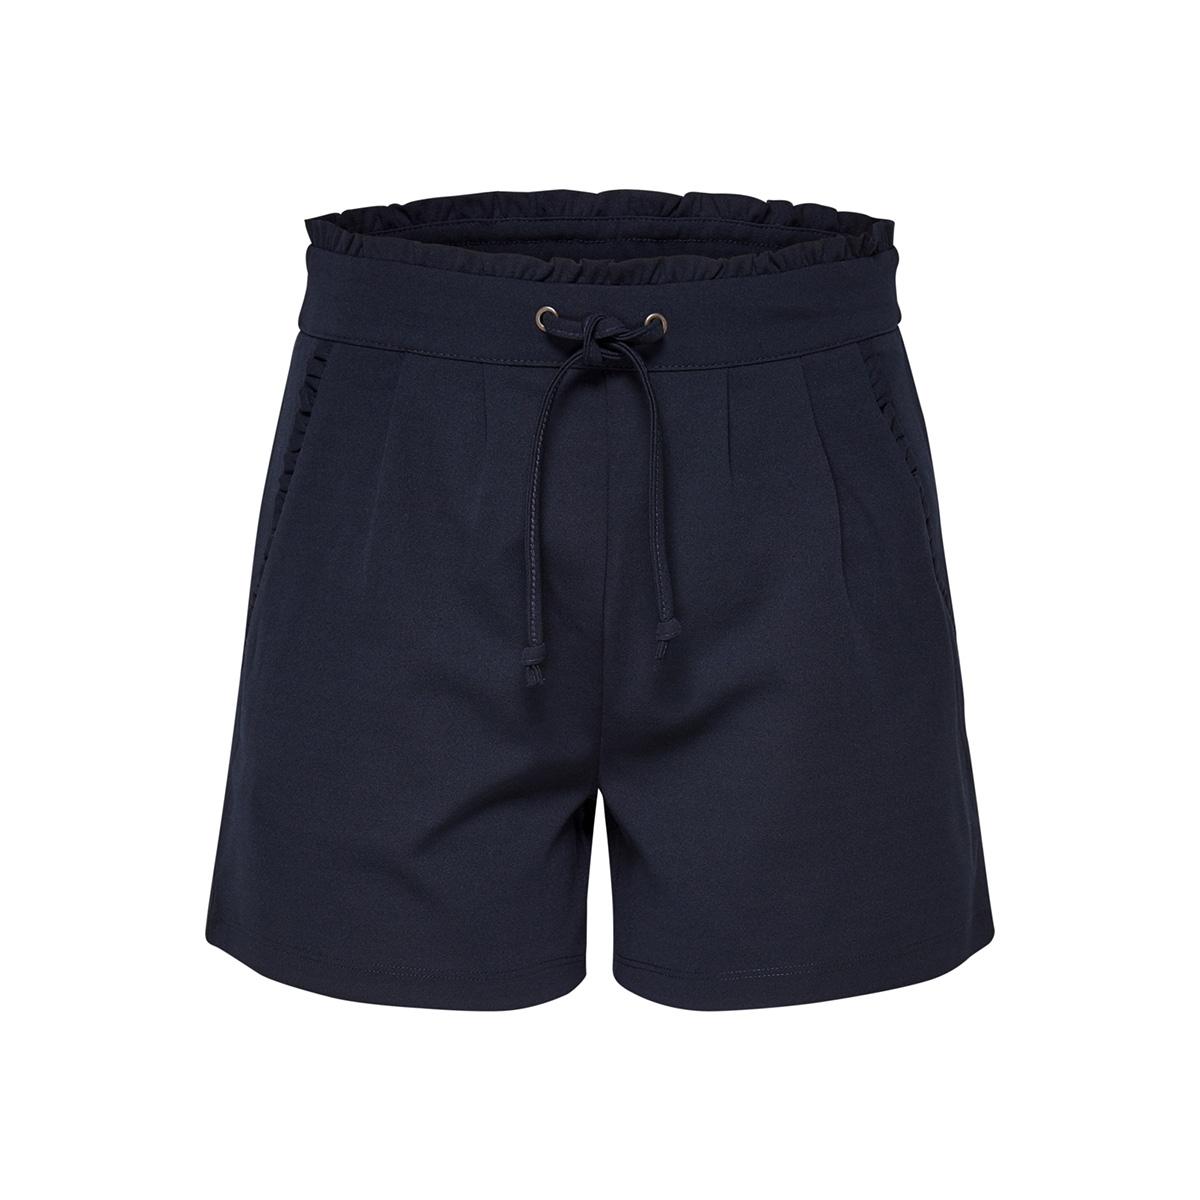 jdycatia shorts jrs noos 15152797 jacqueline de yong korte broek sky captain